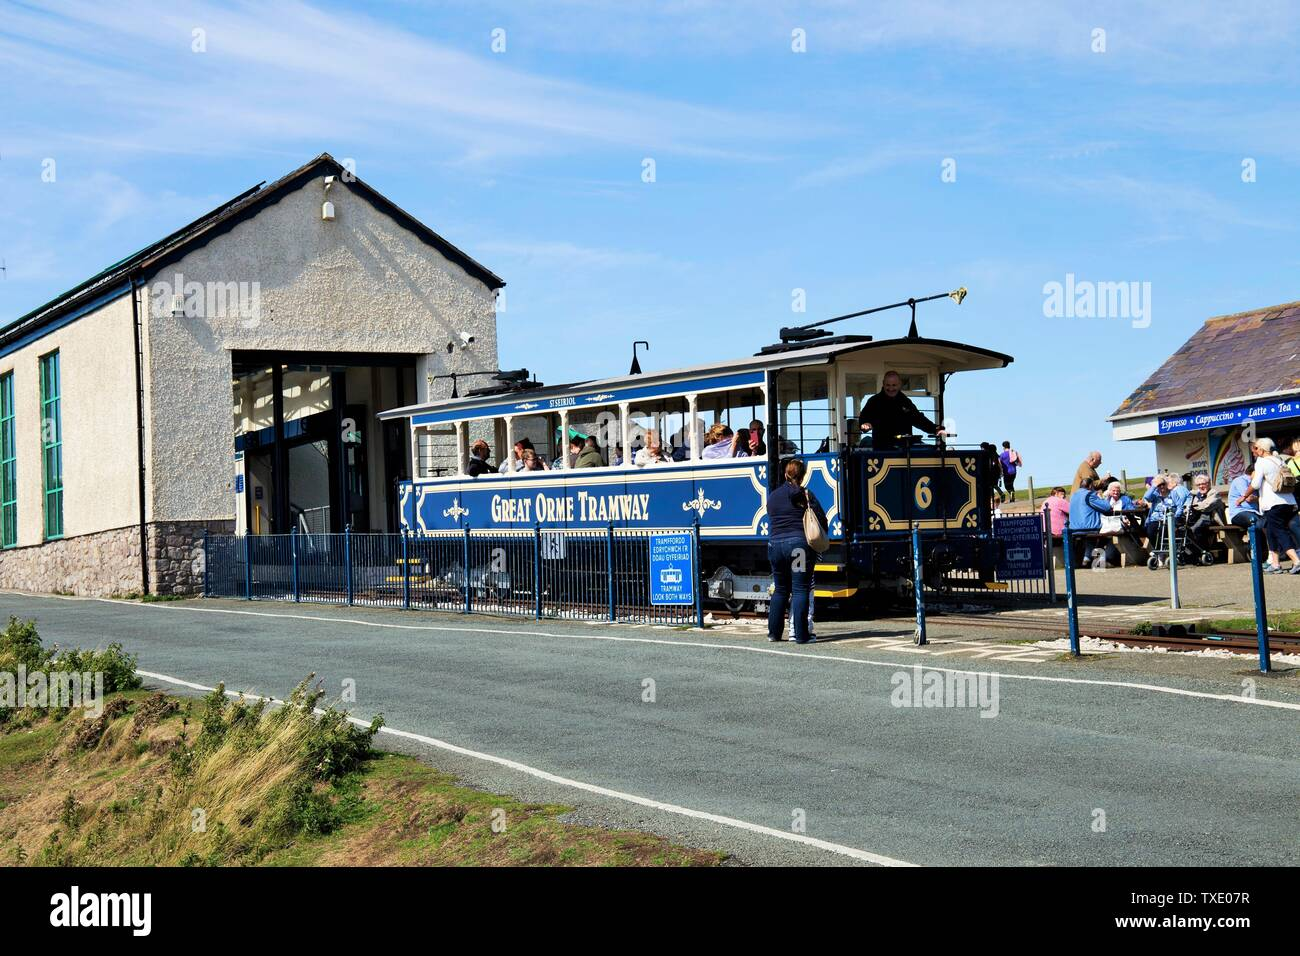 Tramway Great Orme, Llandudno, Wales, UK, United Kingdom Stock Photo